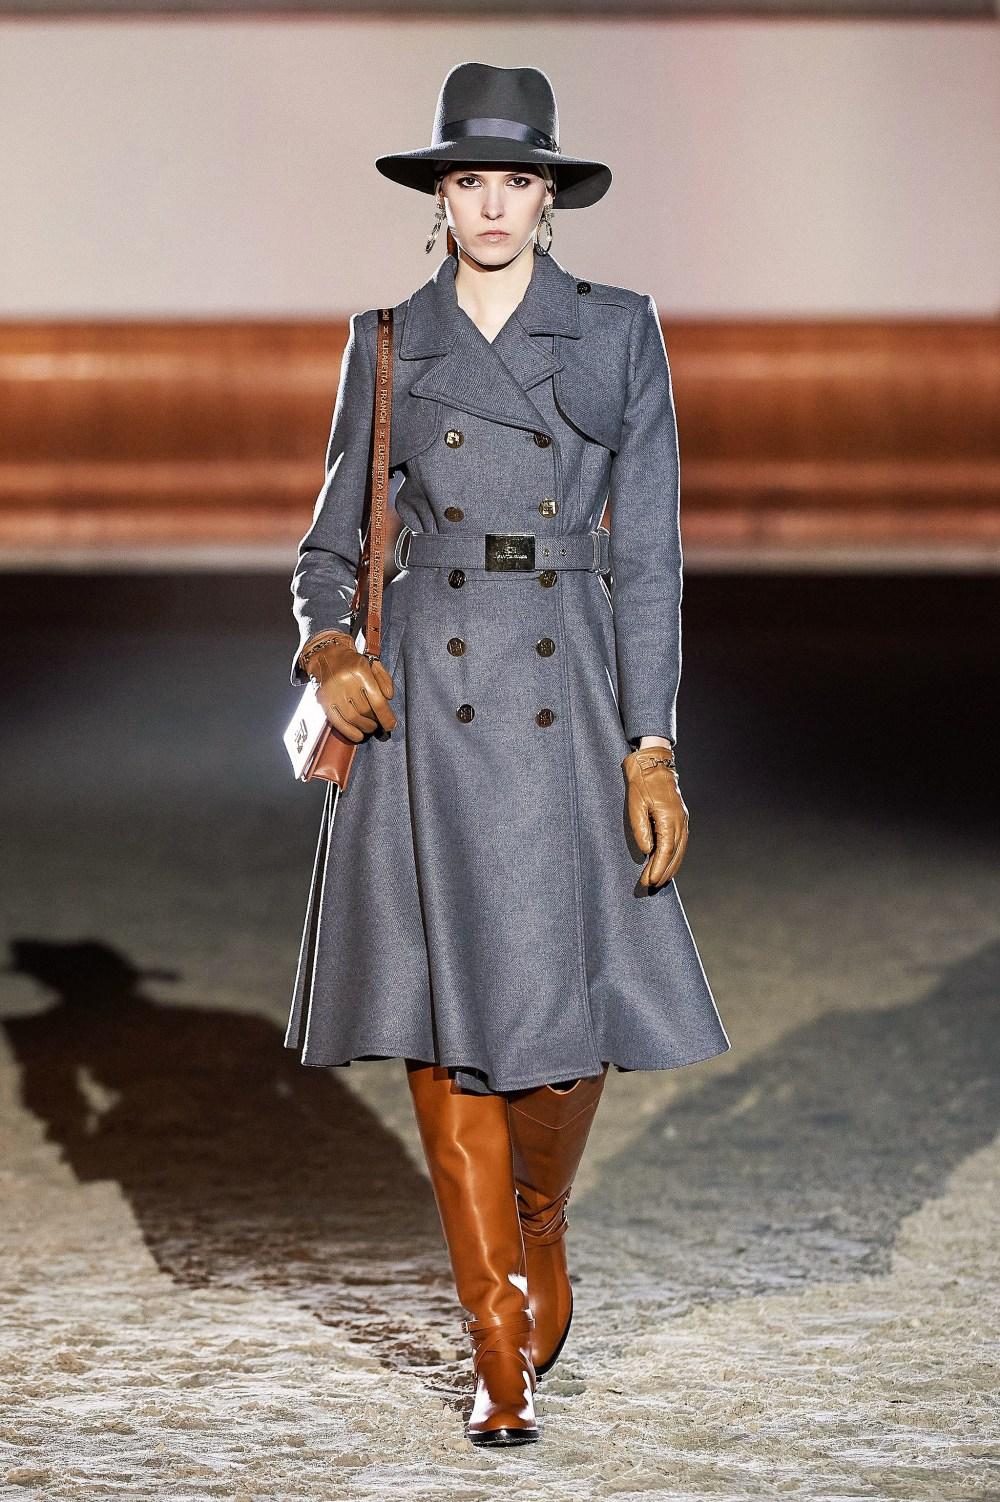 Elisabetta Franchi: Elisabetta Franchi Fall Winter 2021-22 Fashion Show Photo #17